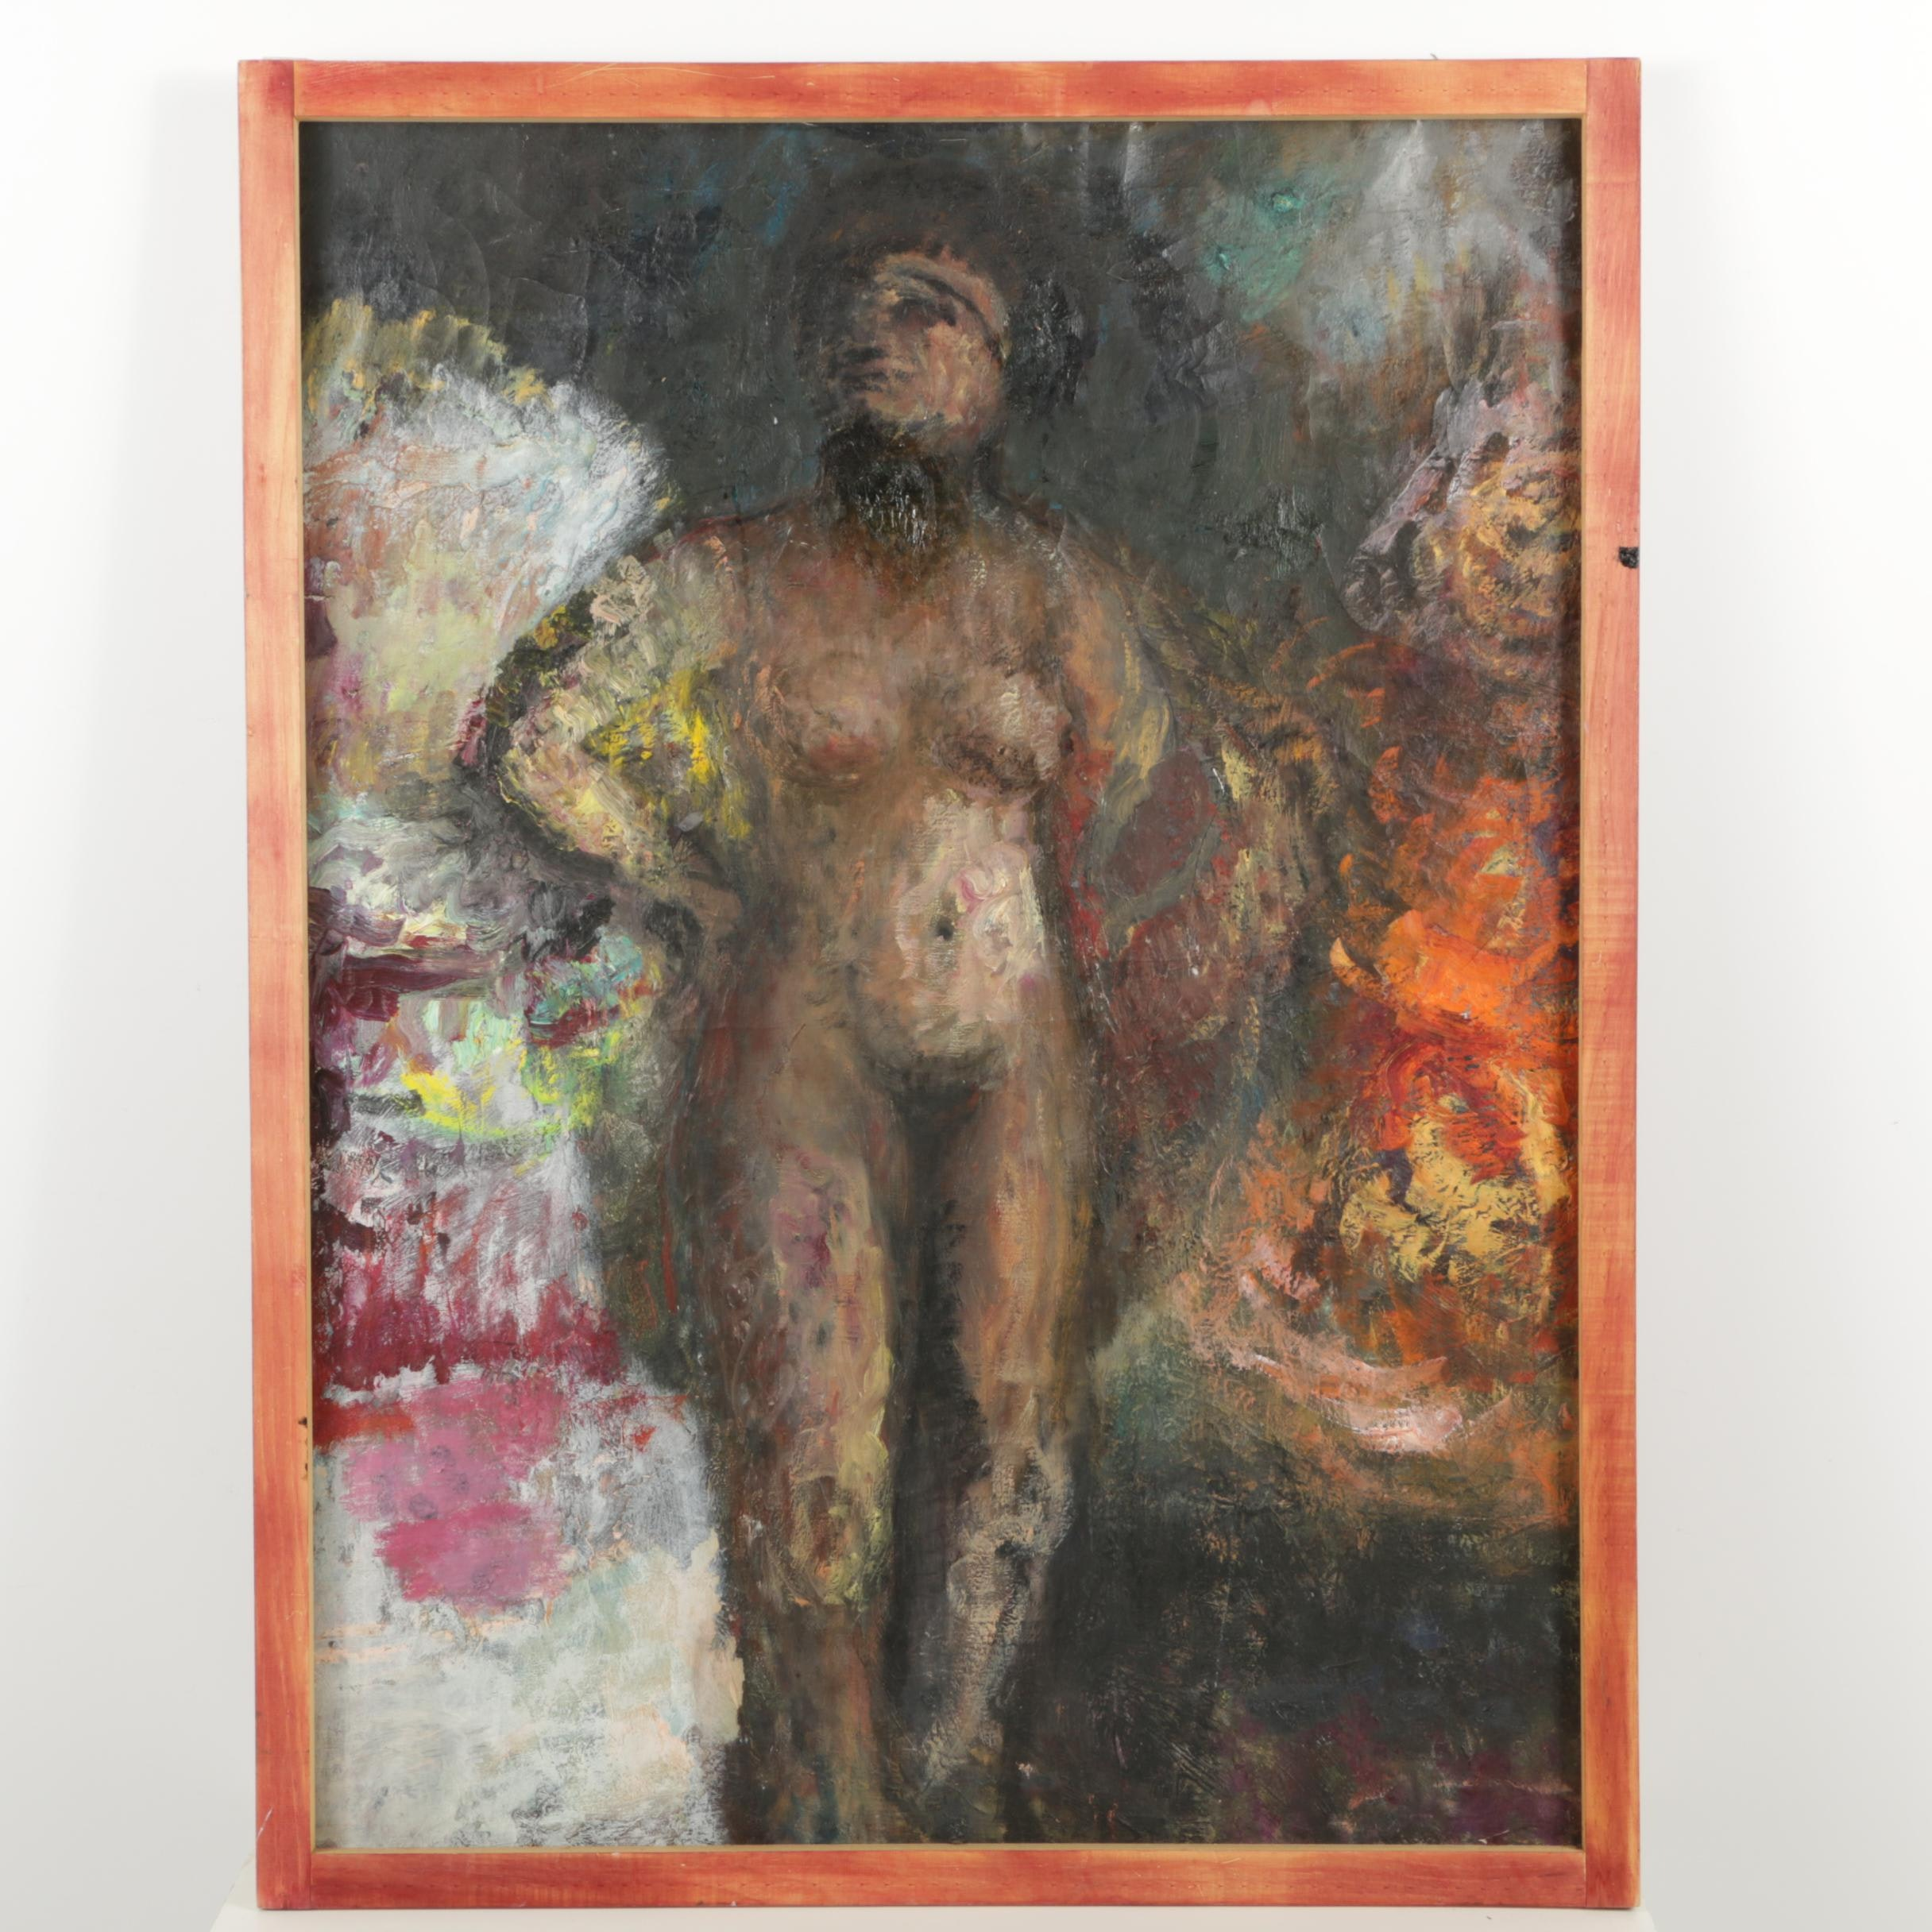 Oil Painting on Canvas of Nude Figure